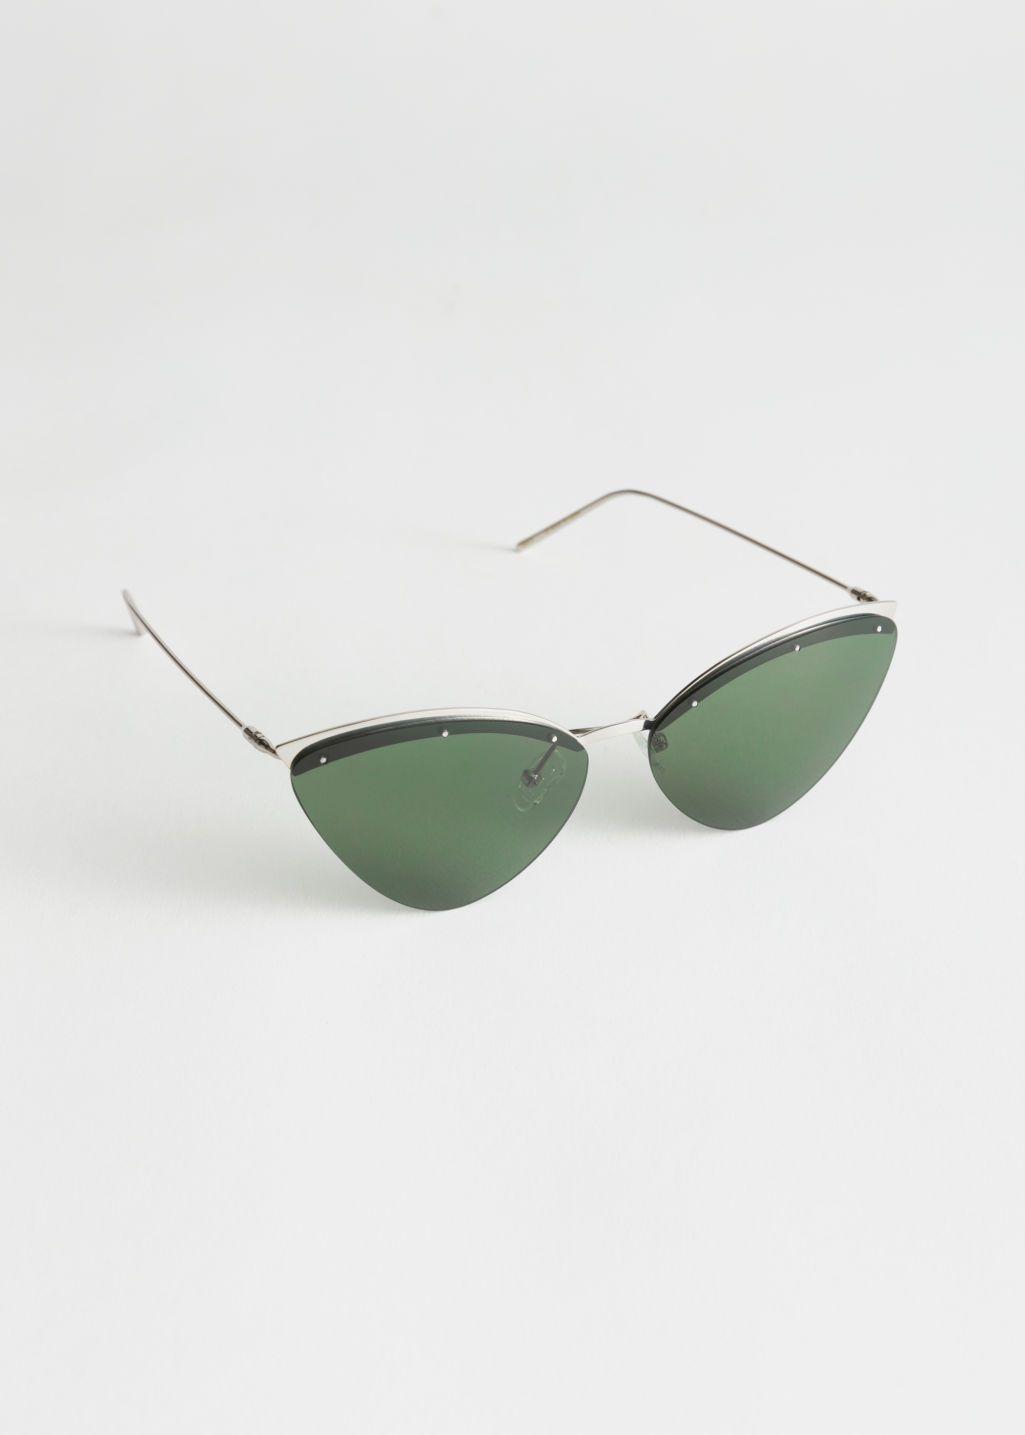 9b2696293e2afe Frameless Cat Eye Sunglasses - Silver - Sunglasses -   Other Stories